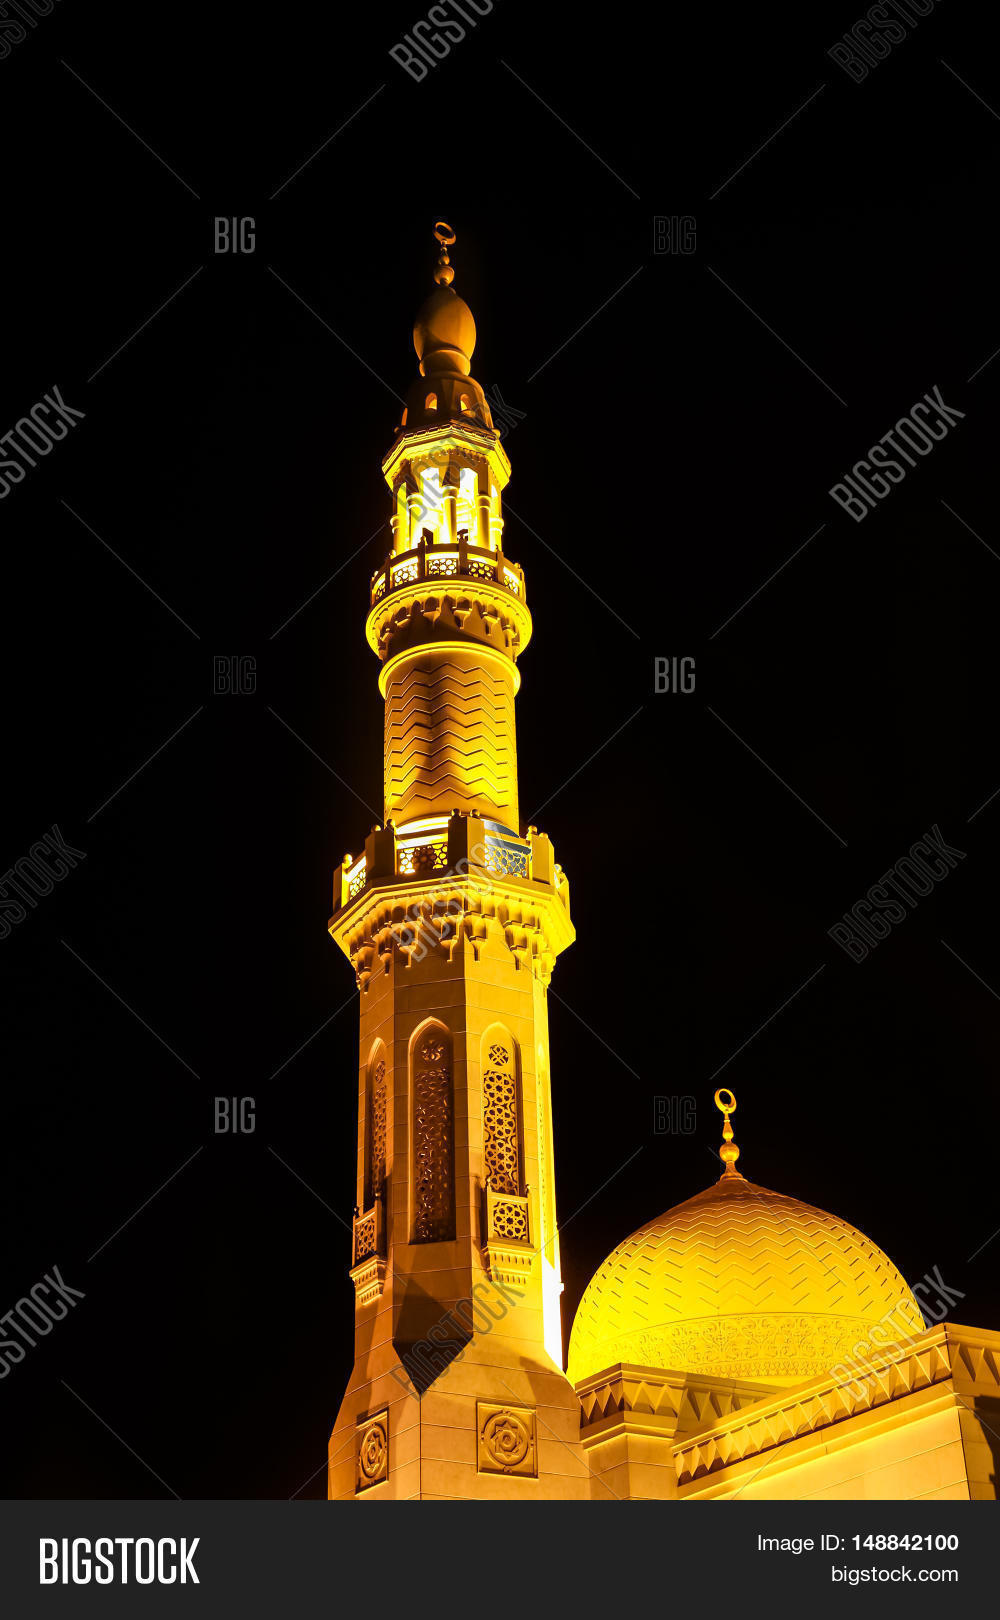 Minaret jumeirah mosque illuminated image photo bigstock the minaret of jumeirah mosque illuminated at night in jumeirah beach dubai uae biocorpaavc